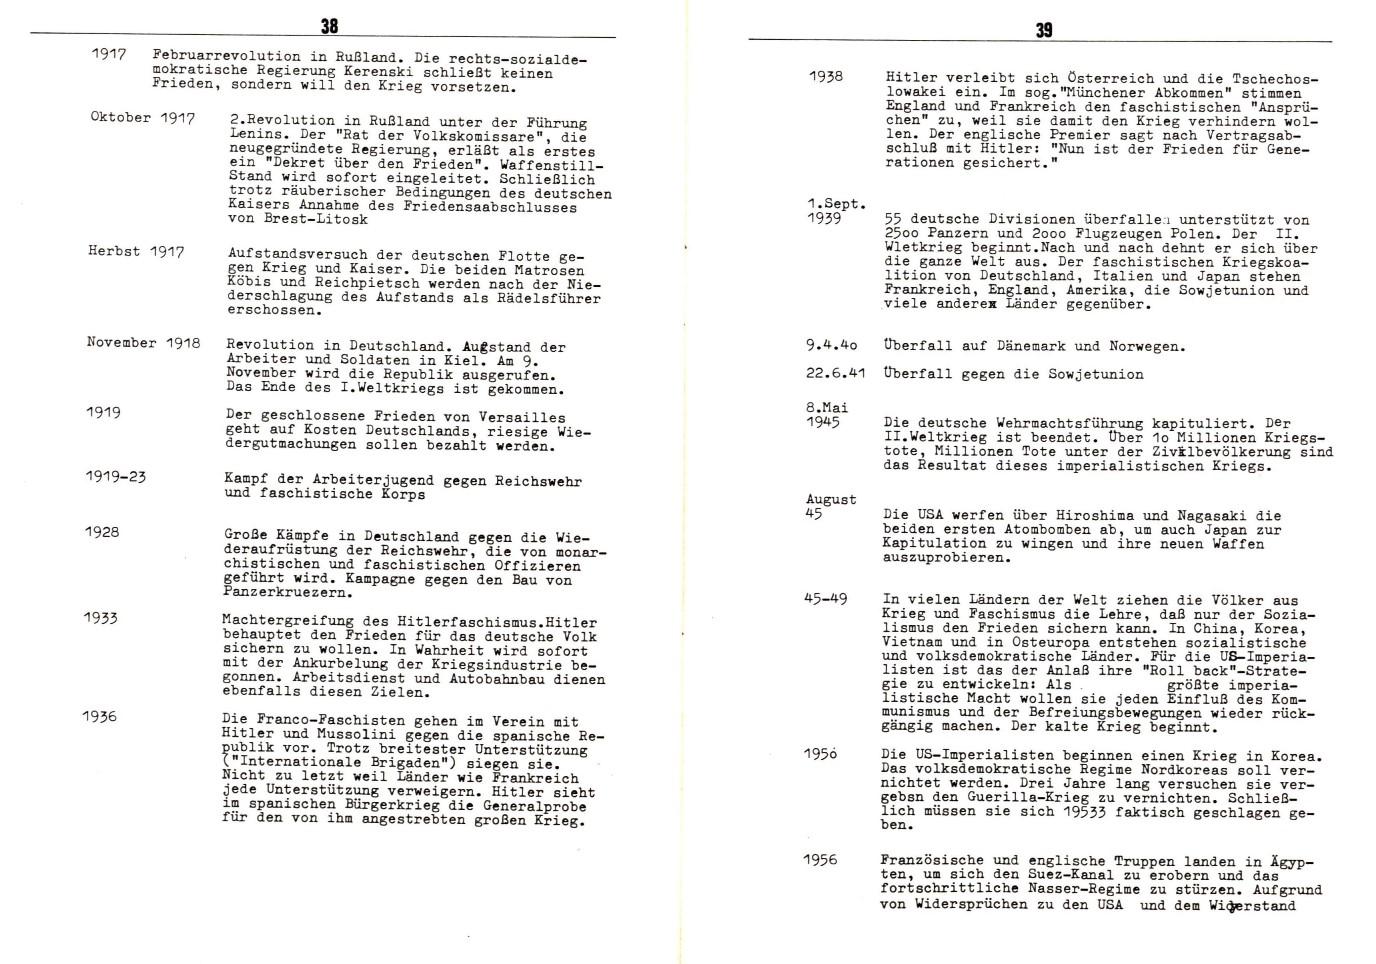 KJVD_1979_Dokumente_zum_Antikriegstag_23